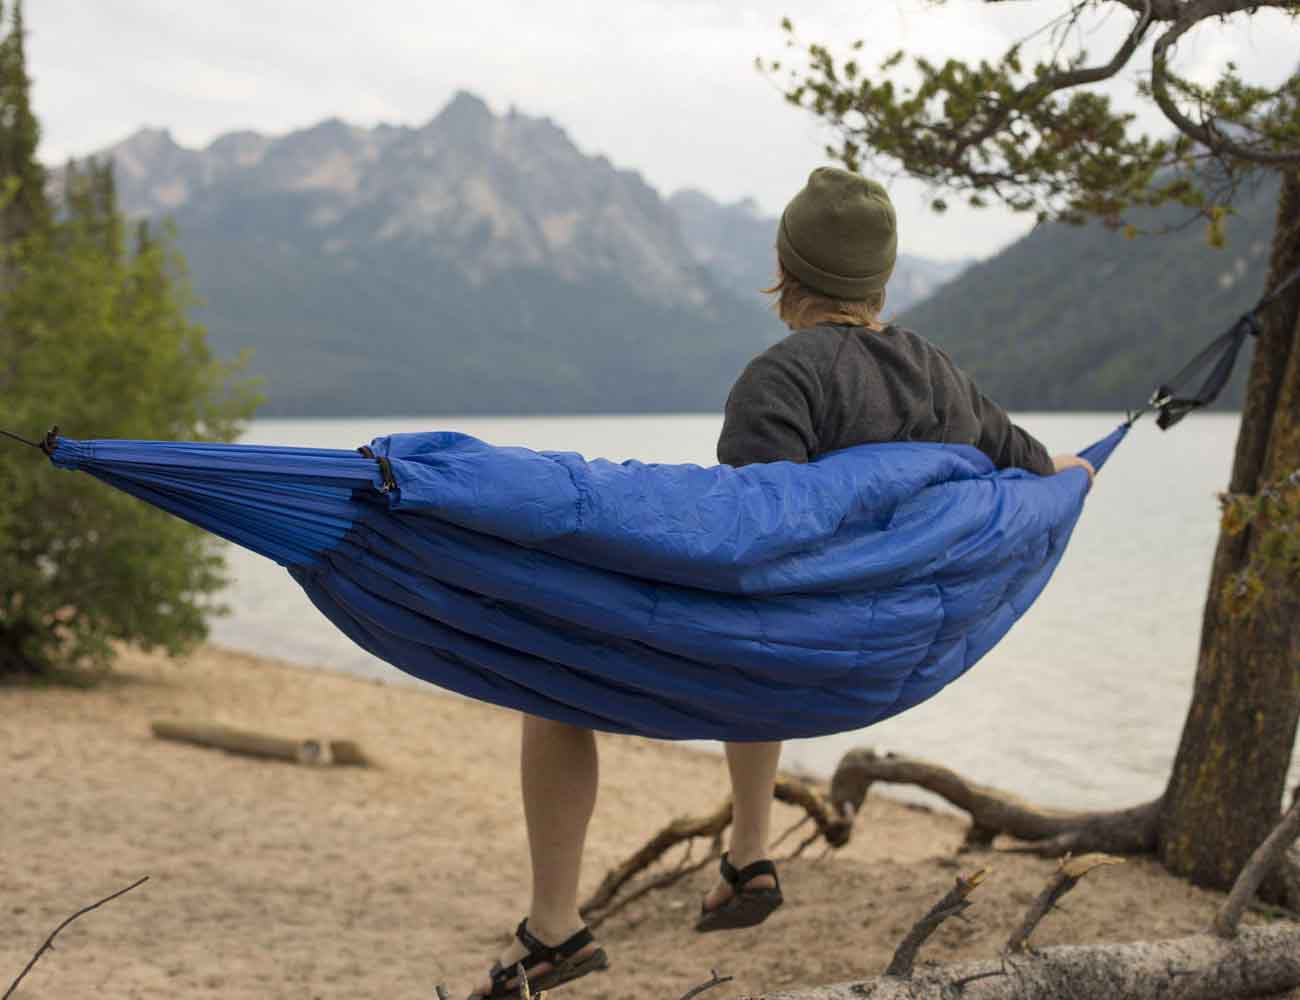 Bison Bag G1 – The World's First Sleeping Bag Hammock ...